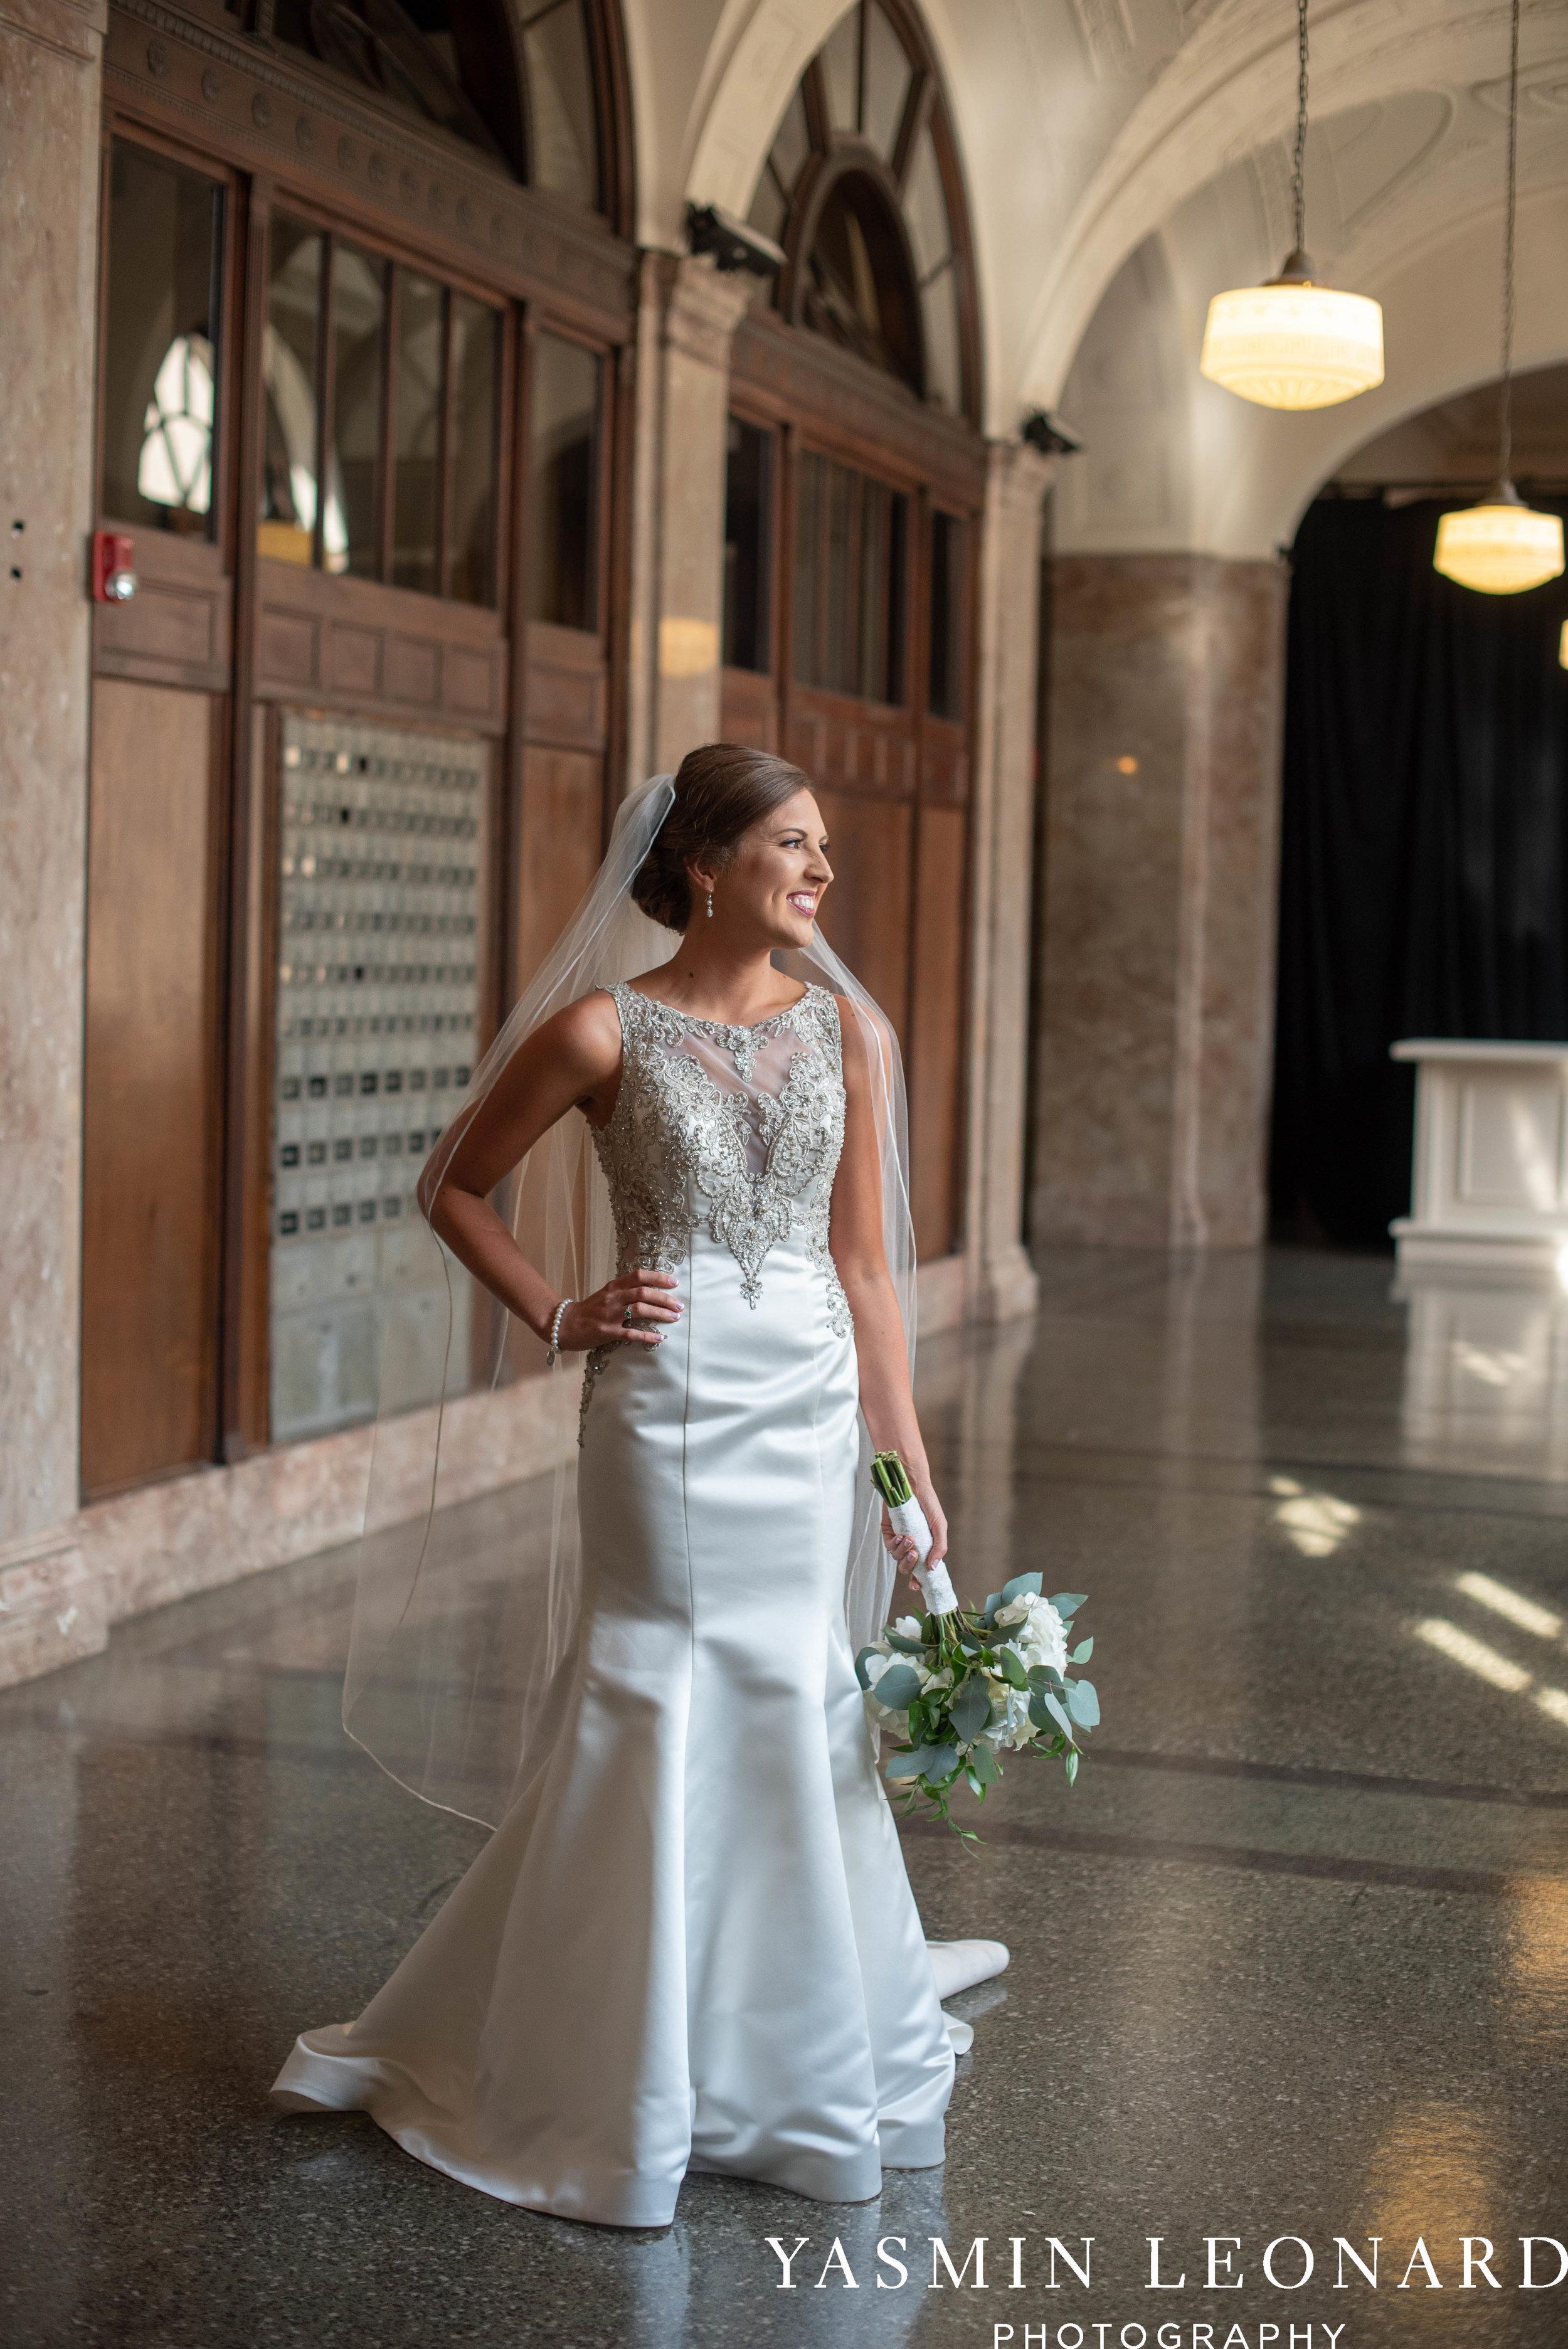 Millennium Center Wedding - Downtown Winston Salem - Winston Salem Wedding Photographer - Winston Salem Venues - Indoor Wedding Venues - NC Wedding Photographer - Yasmin Leonard Photography-16.jpg